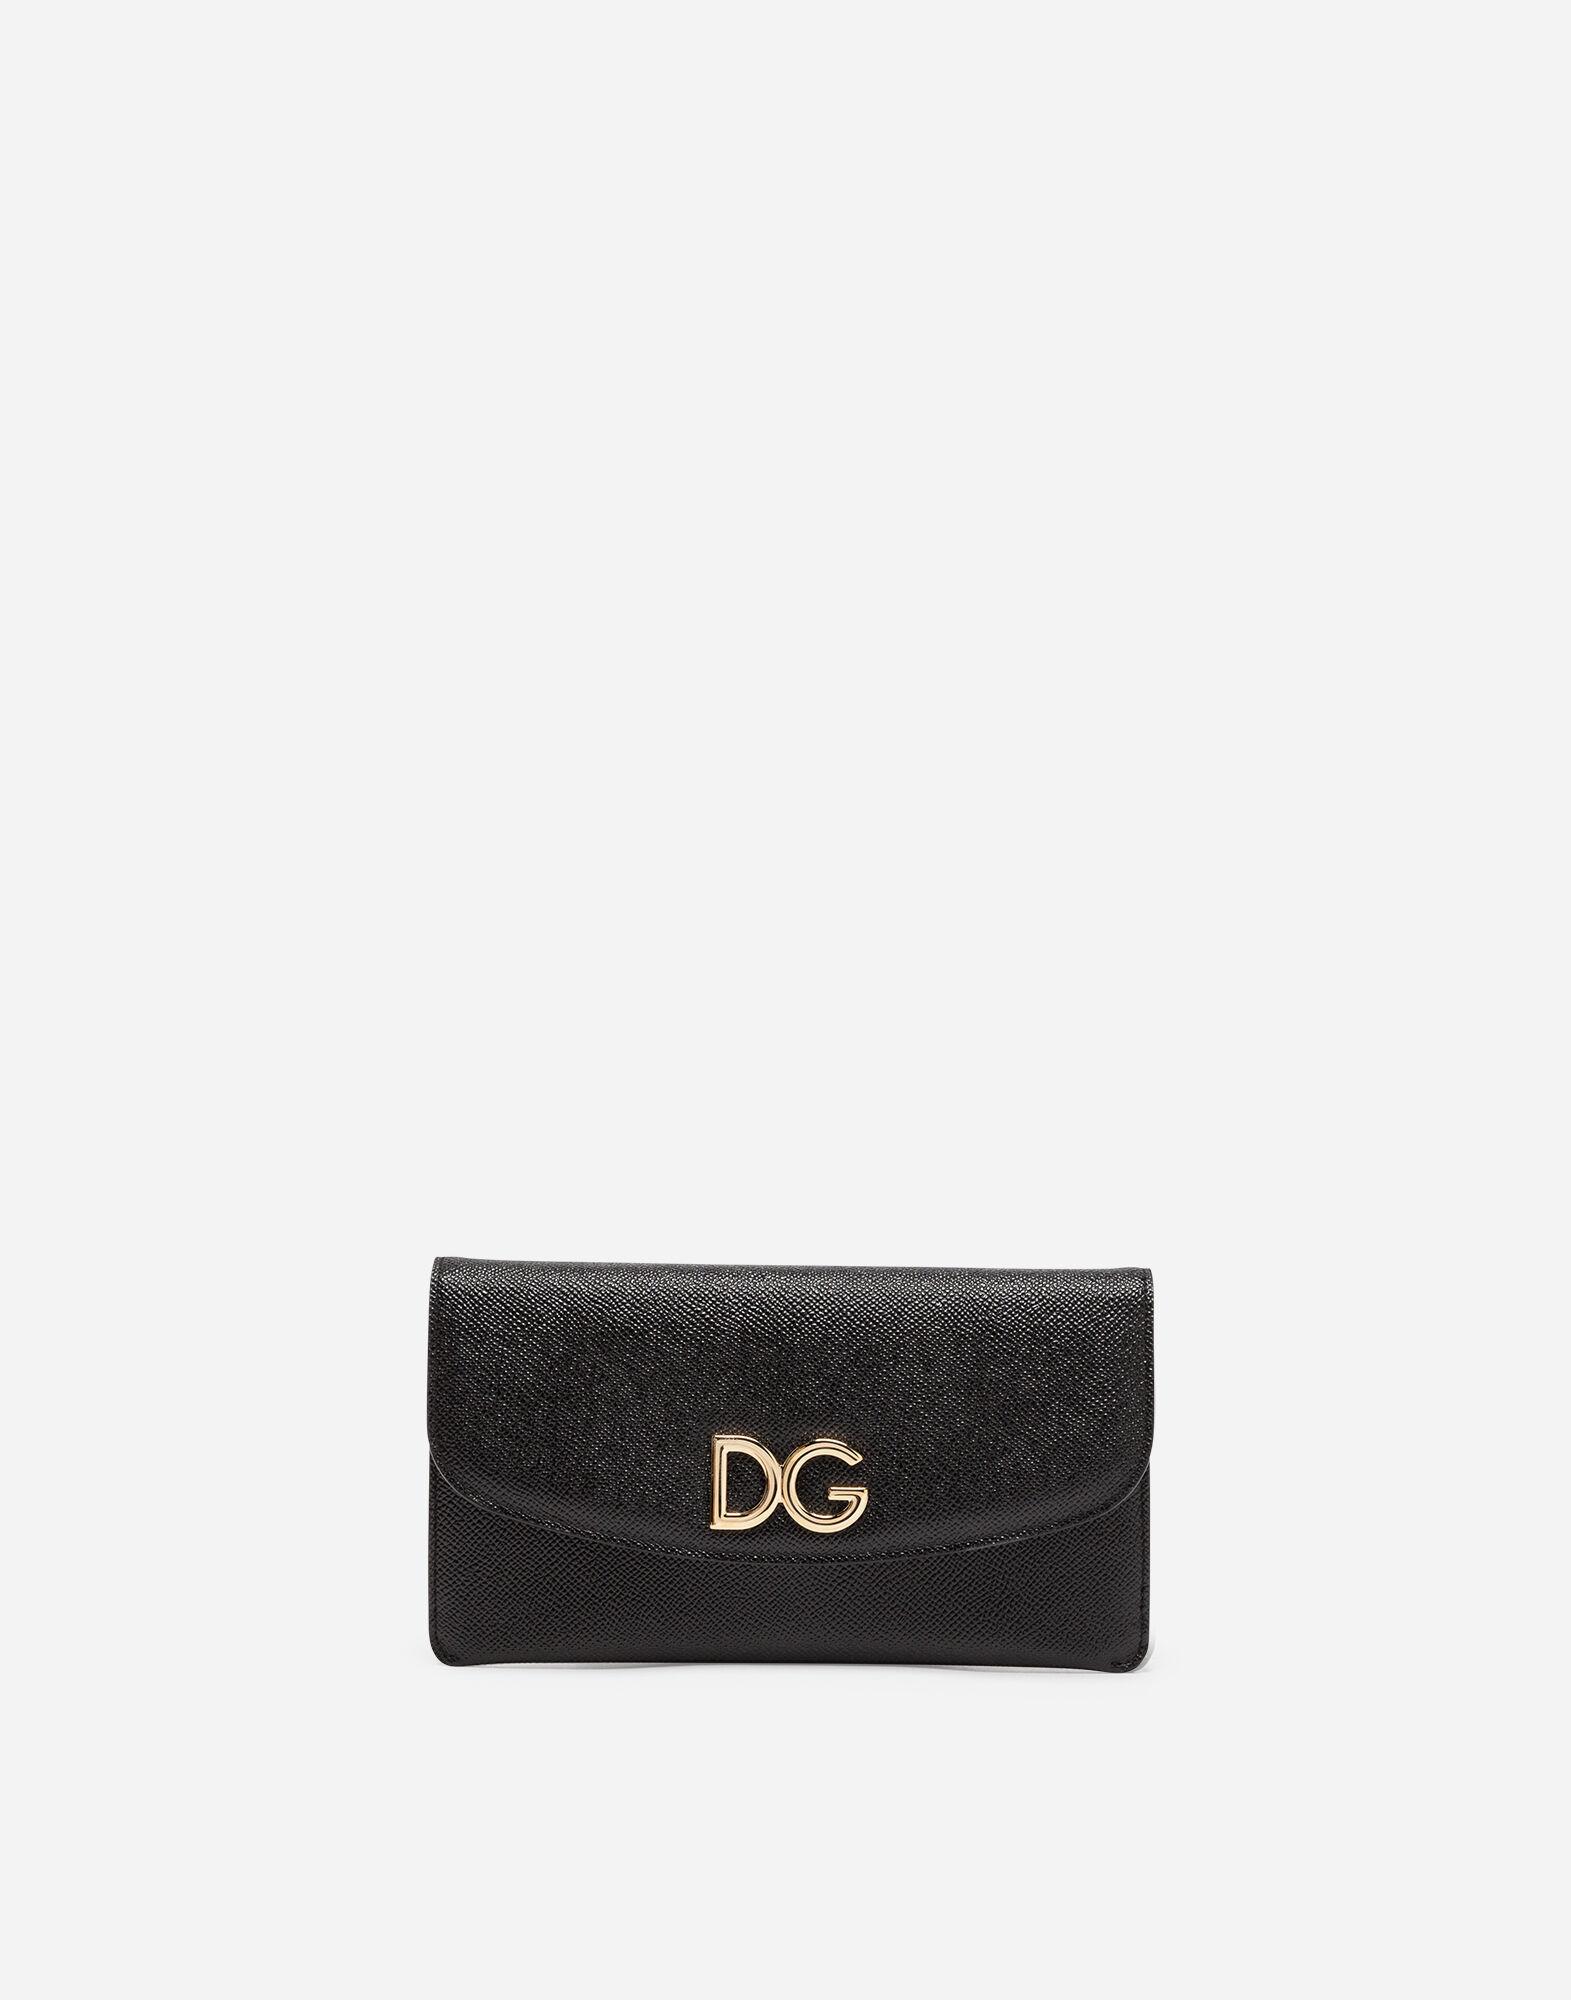 Dauphine wallet bag - Grey Dolce & Gabbana 9kYo9lAITv